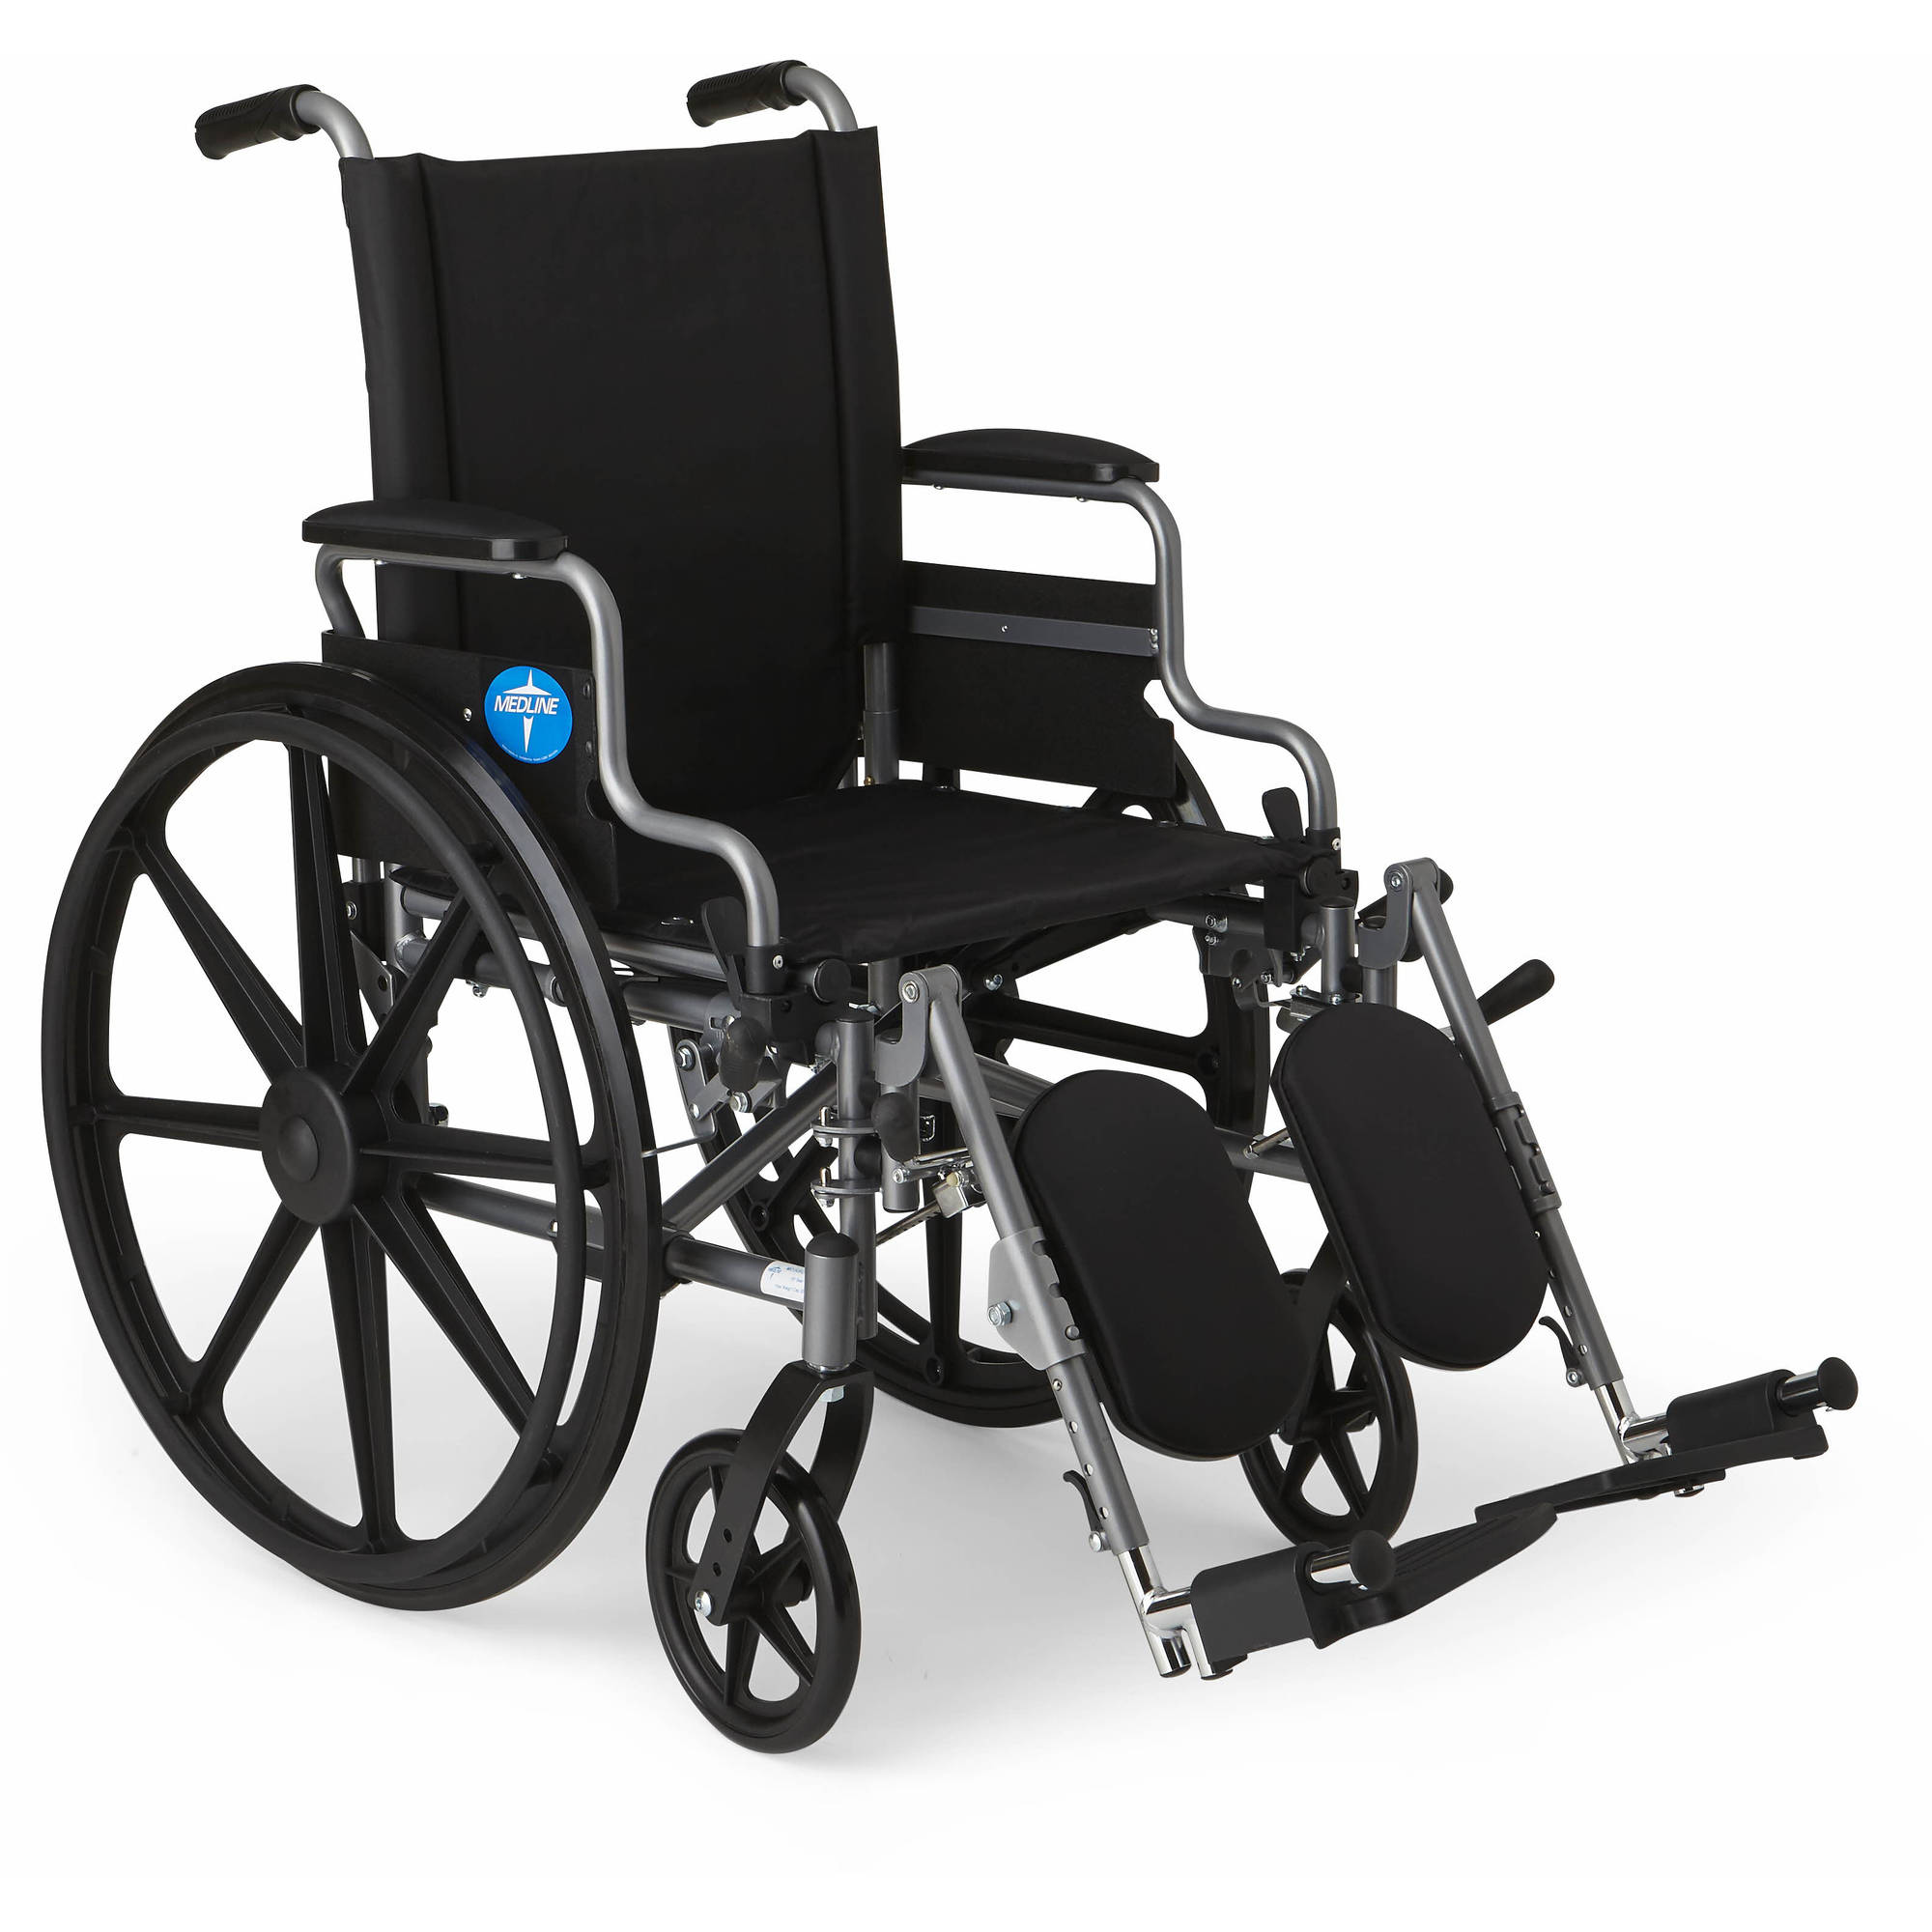 Medline K4 Basic Lightweight Wheelchair, 18 Wide Seat, Desk-Length Arms, Elevating Leg Rests